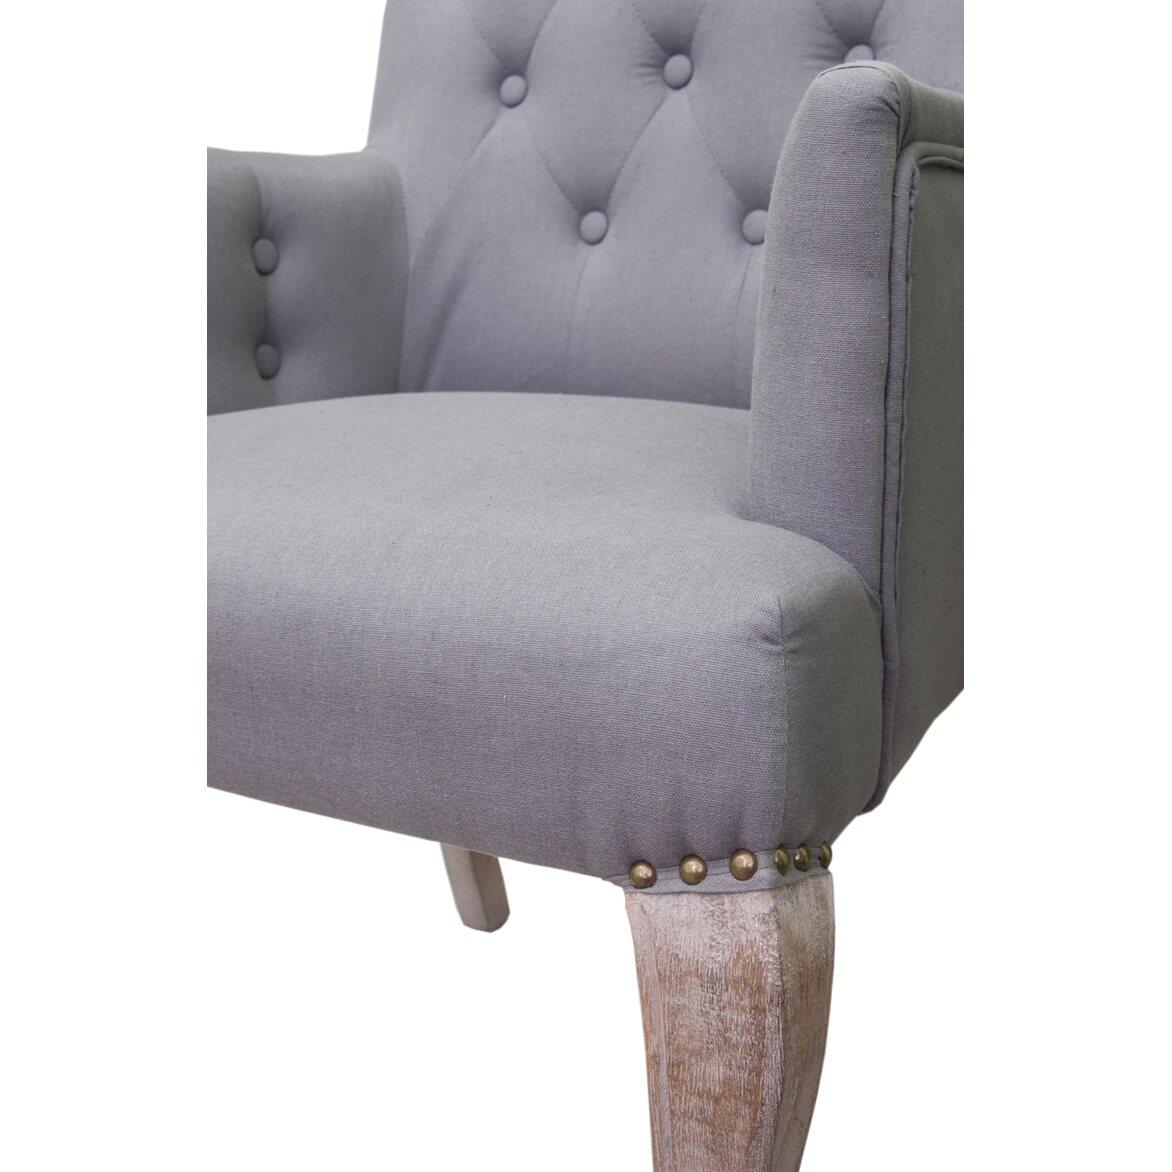 Кресло Deron grey ver.2 5 | Кресло-стул Kingsby